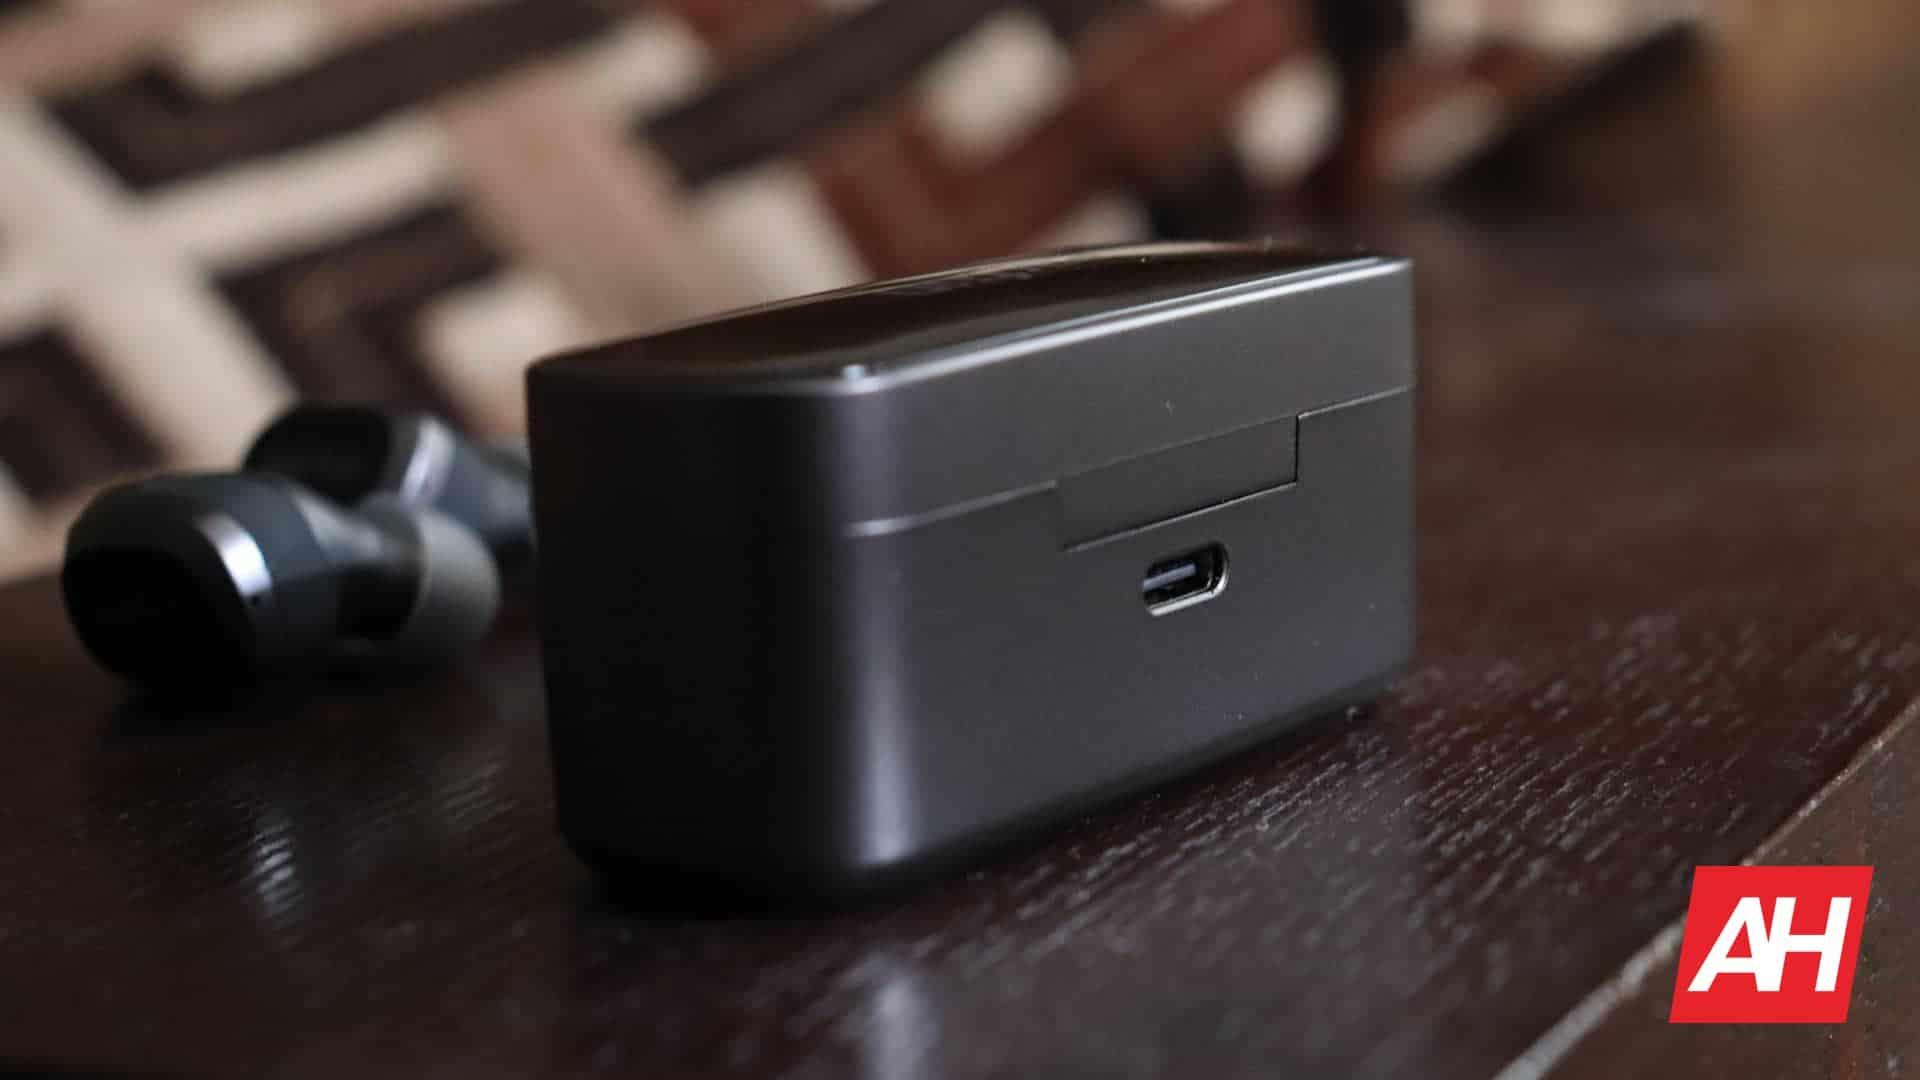 01 4 EarFun Free Pro review hardware DG AH 2020